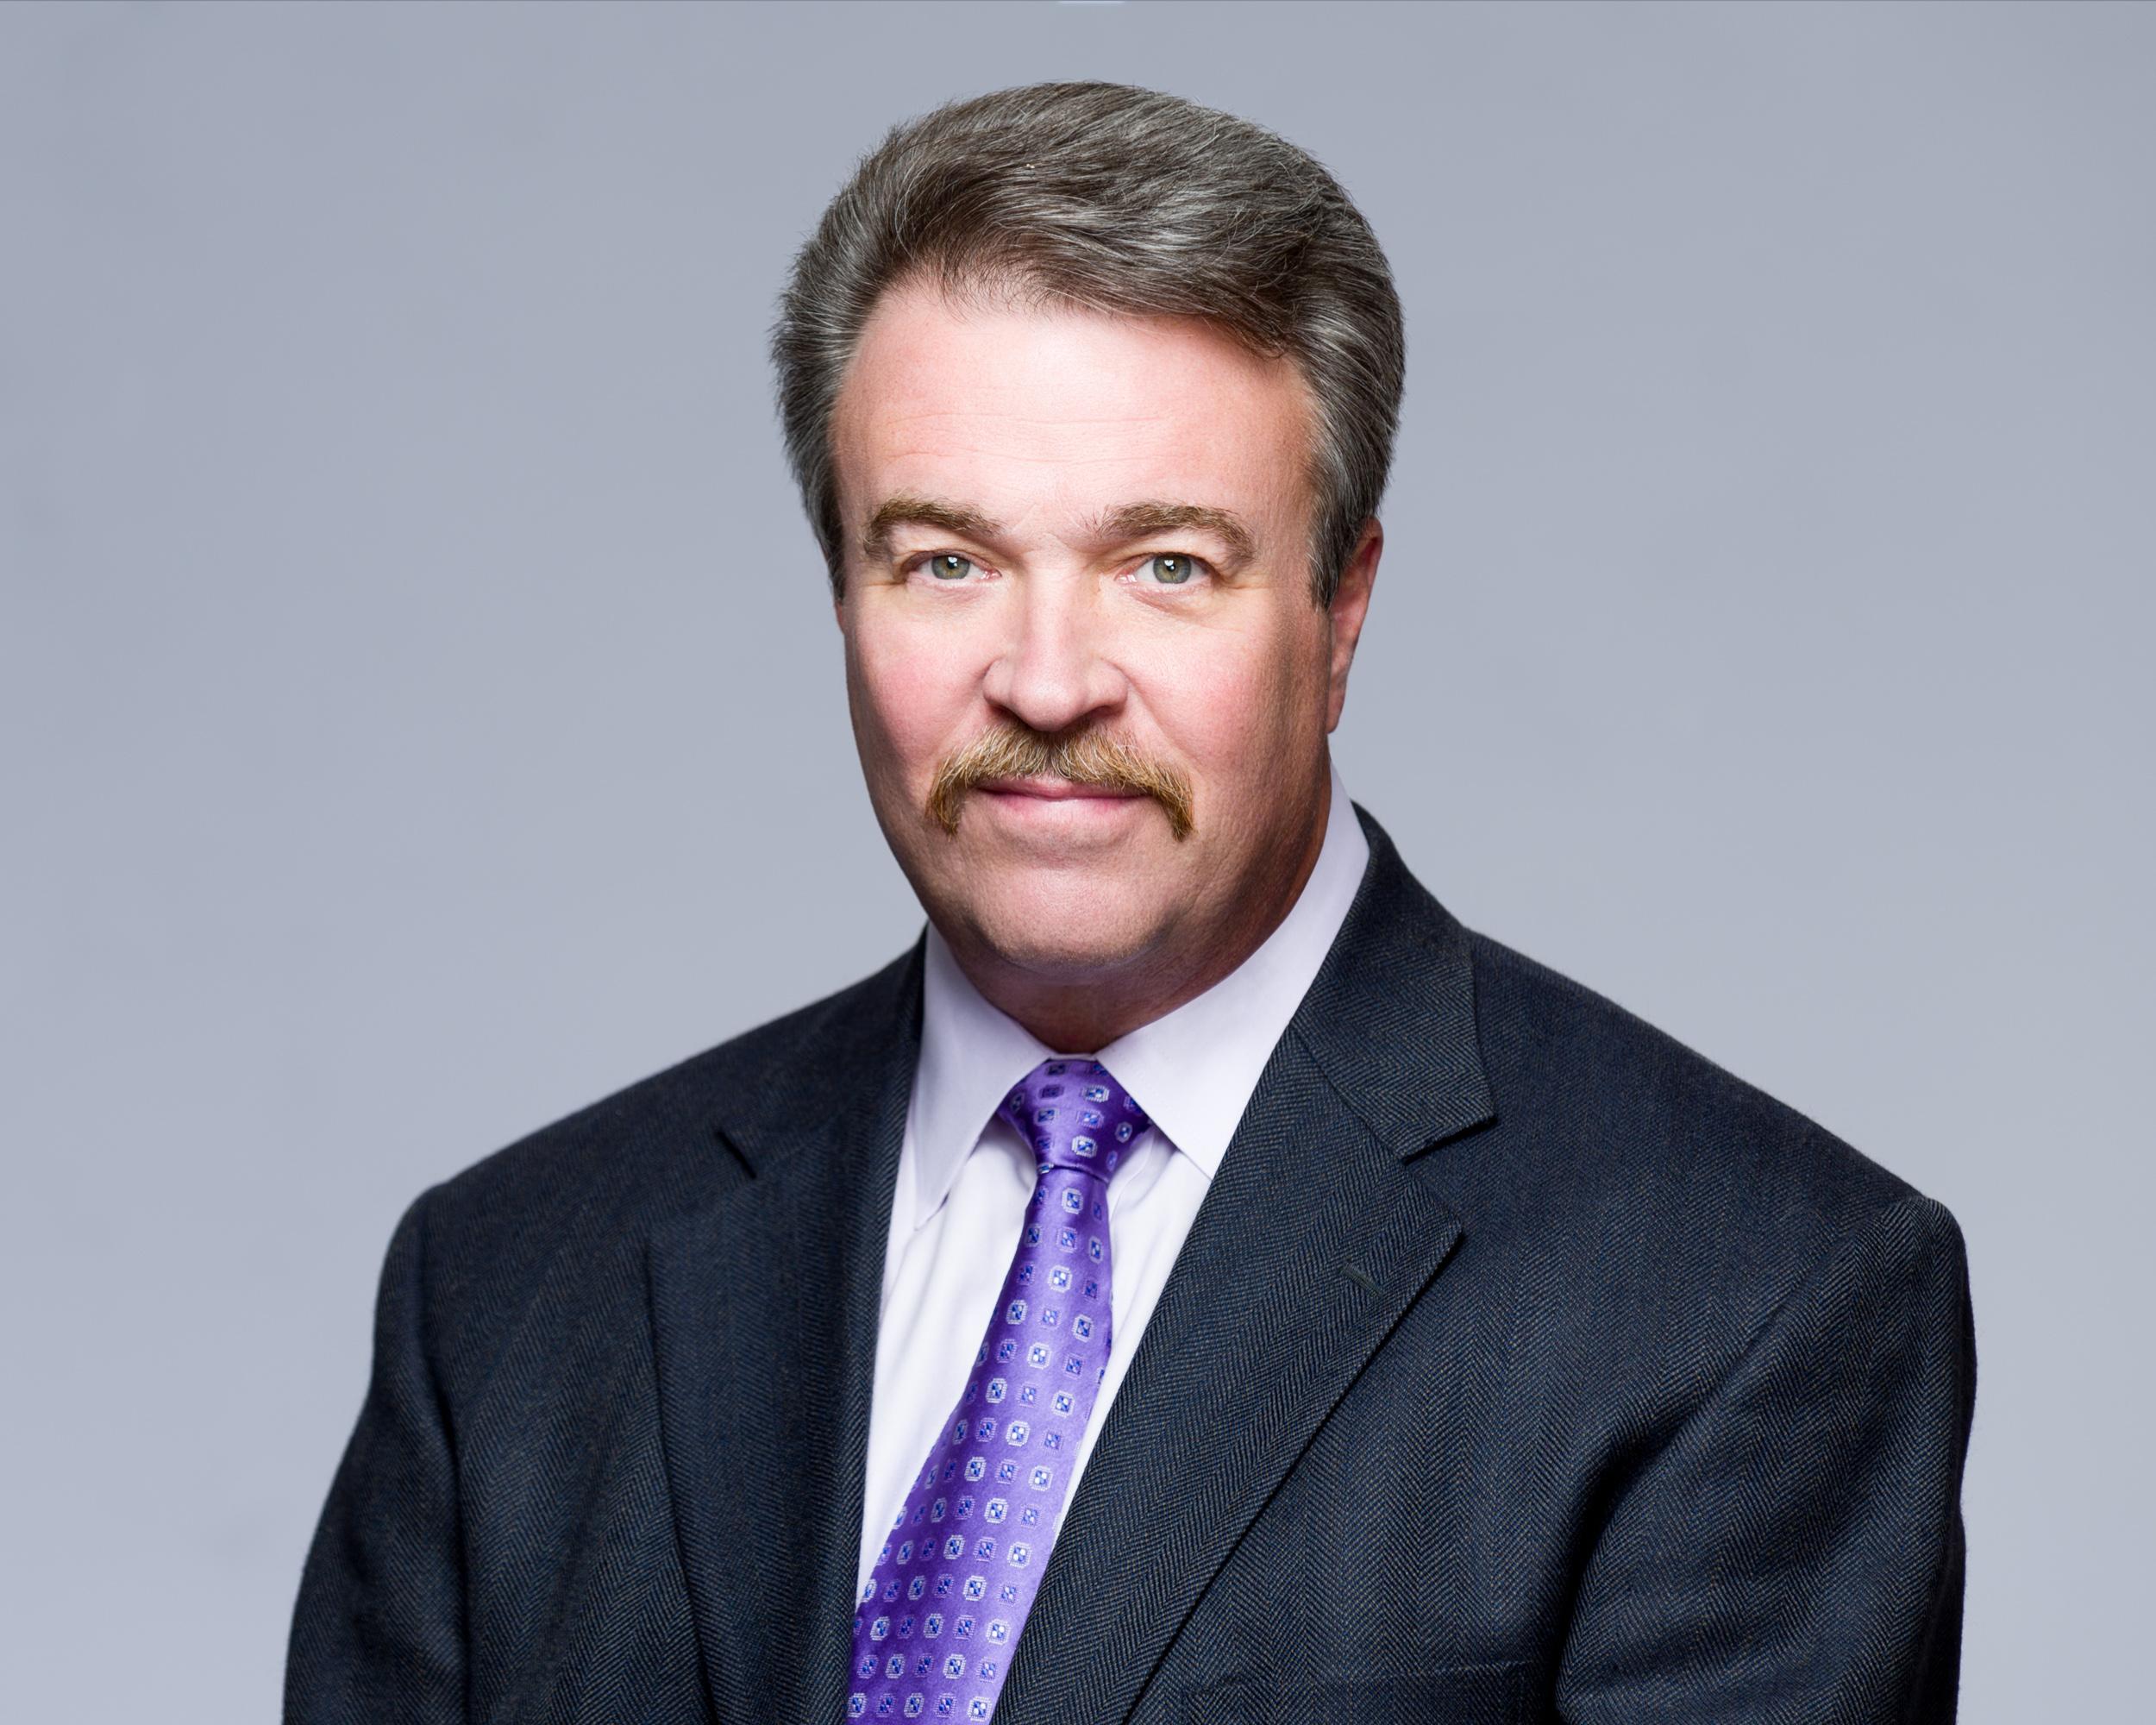 Professional-Headshots-Atlanta-Steve-Glass-1.jpg